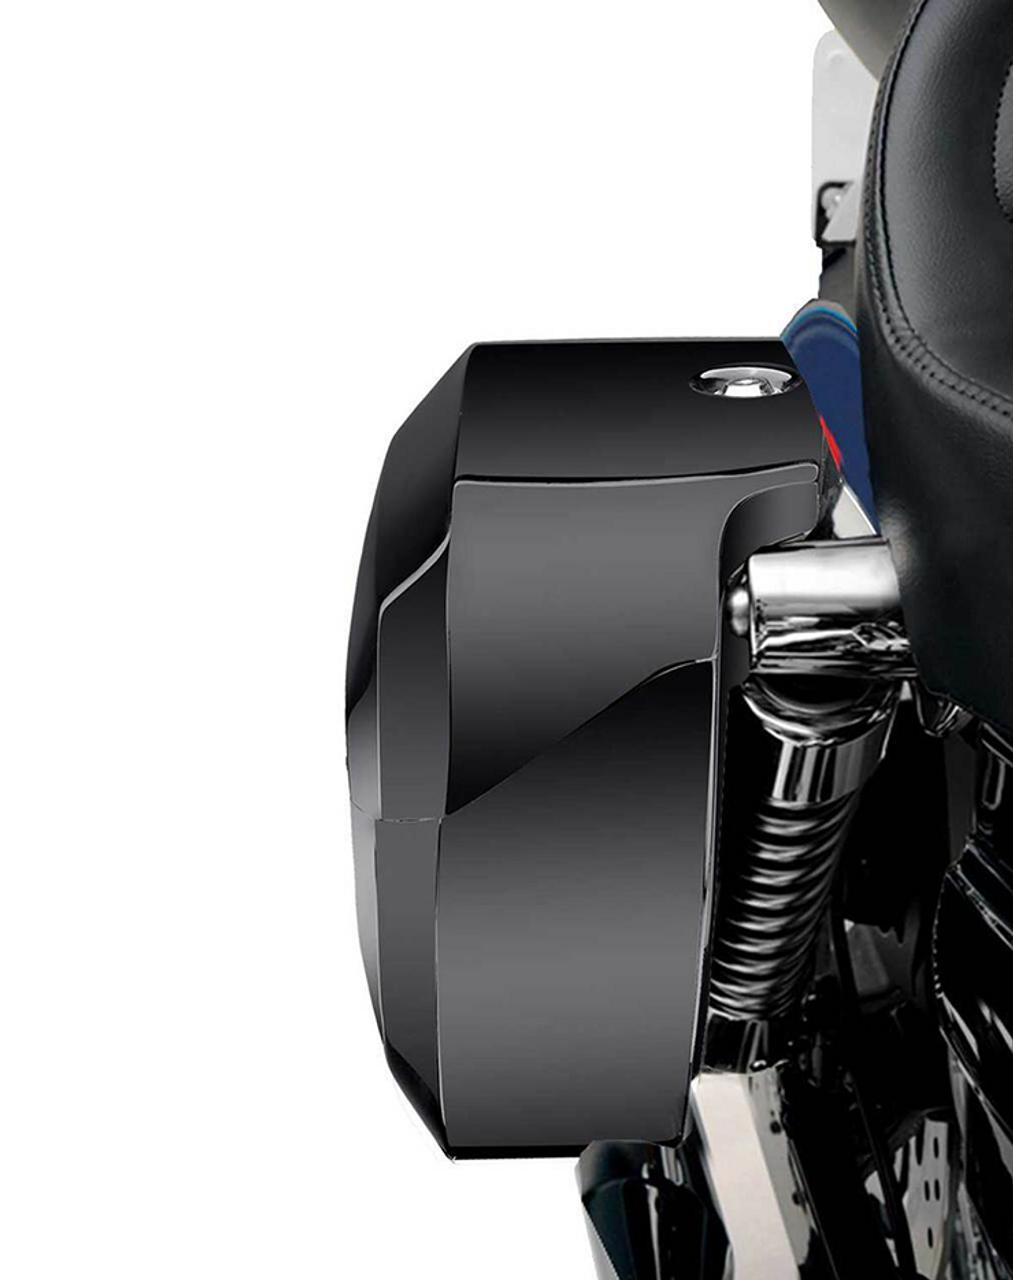 Yamaha V Star 650 Classic Viking Lamellar Large Painted Shock Cutout Hard Motorcycle Saddlebags Shock Cutout View